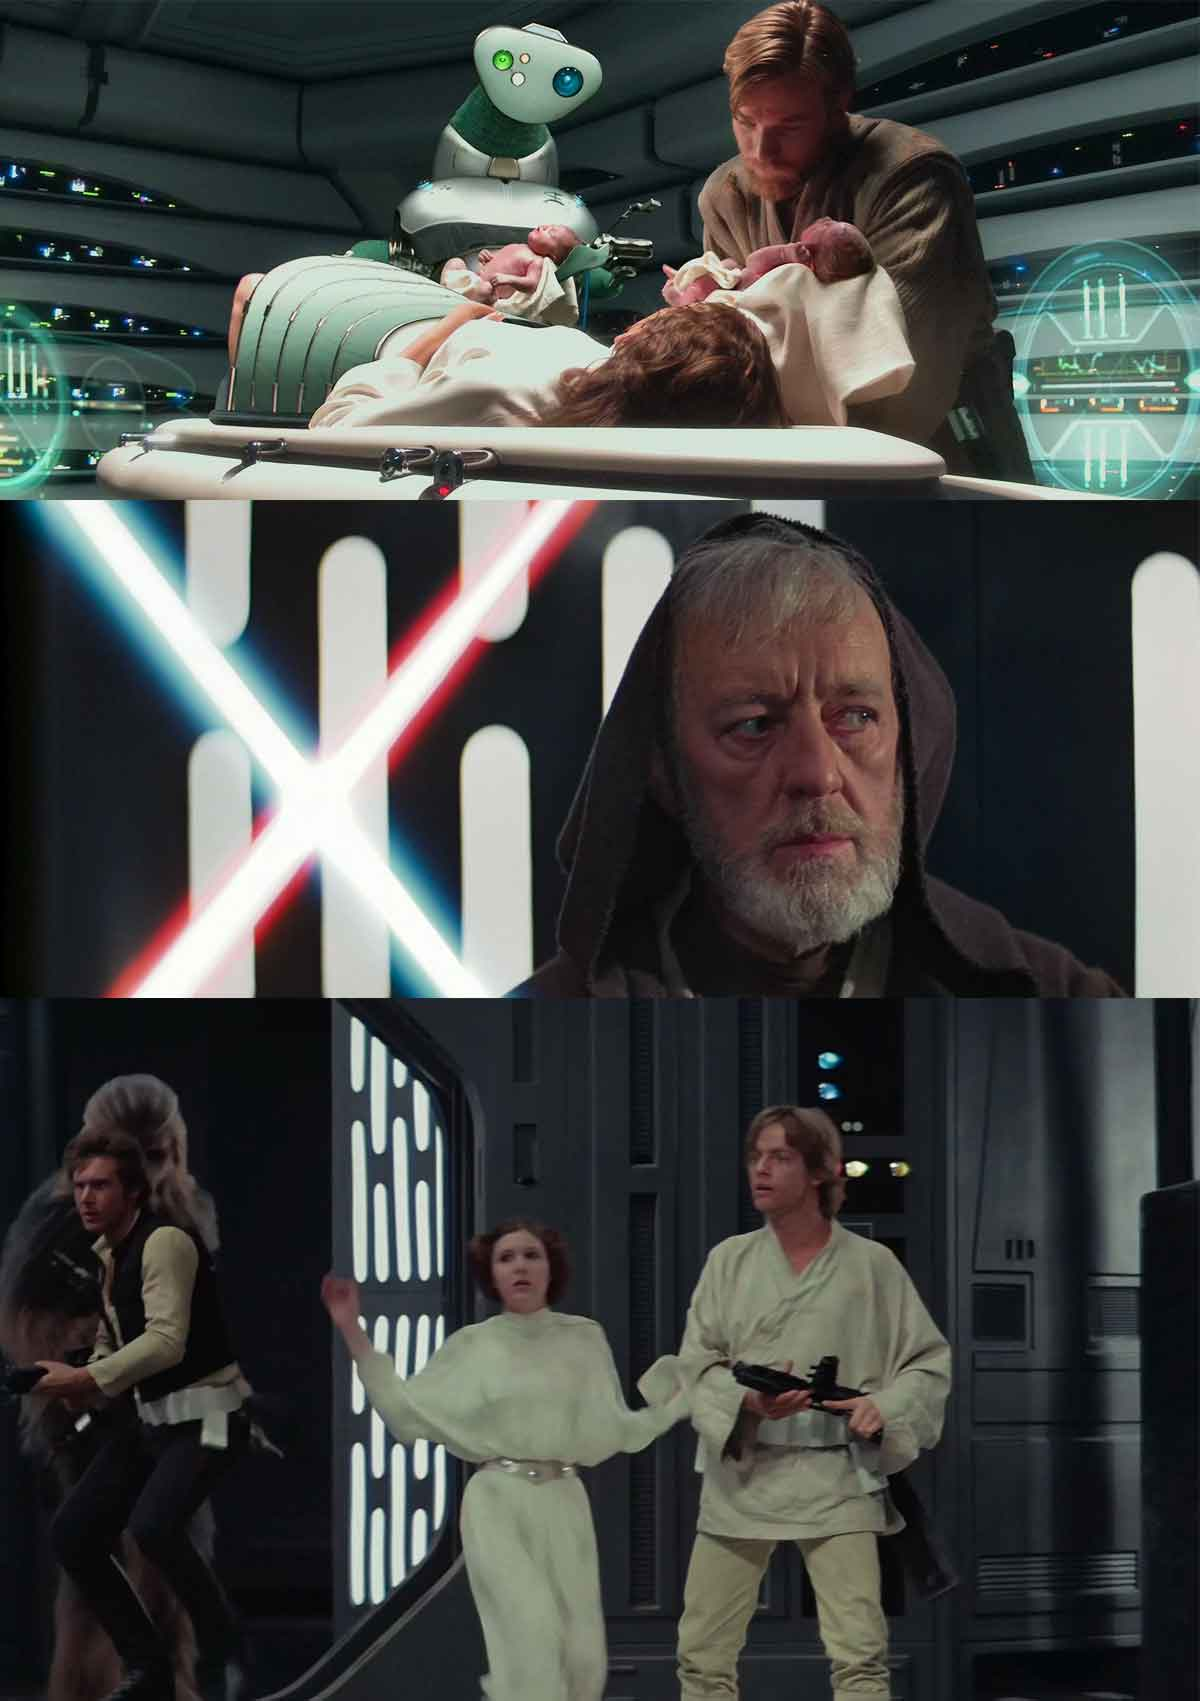 Fans de Star Wars descubren un detalle conmovedor de Obi-Wan Kenobi